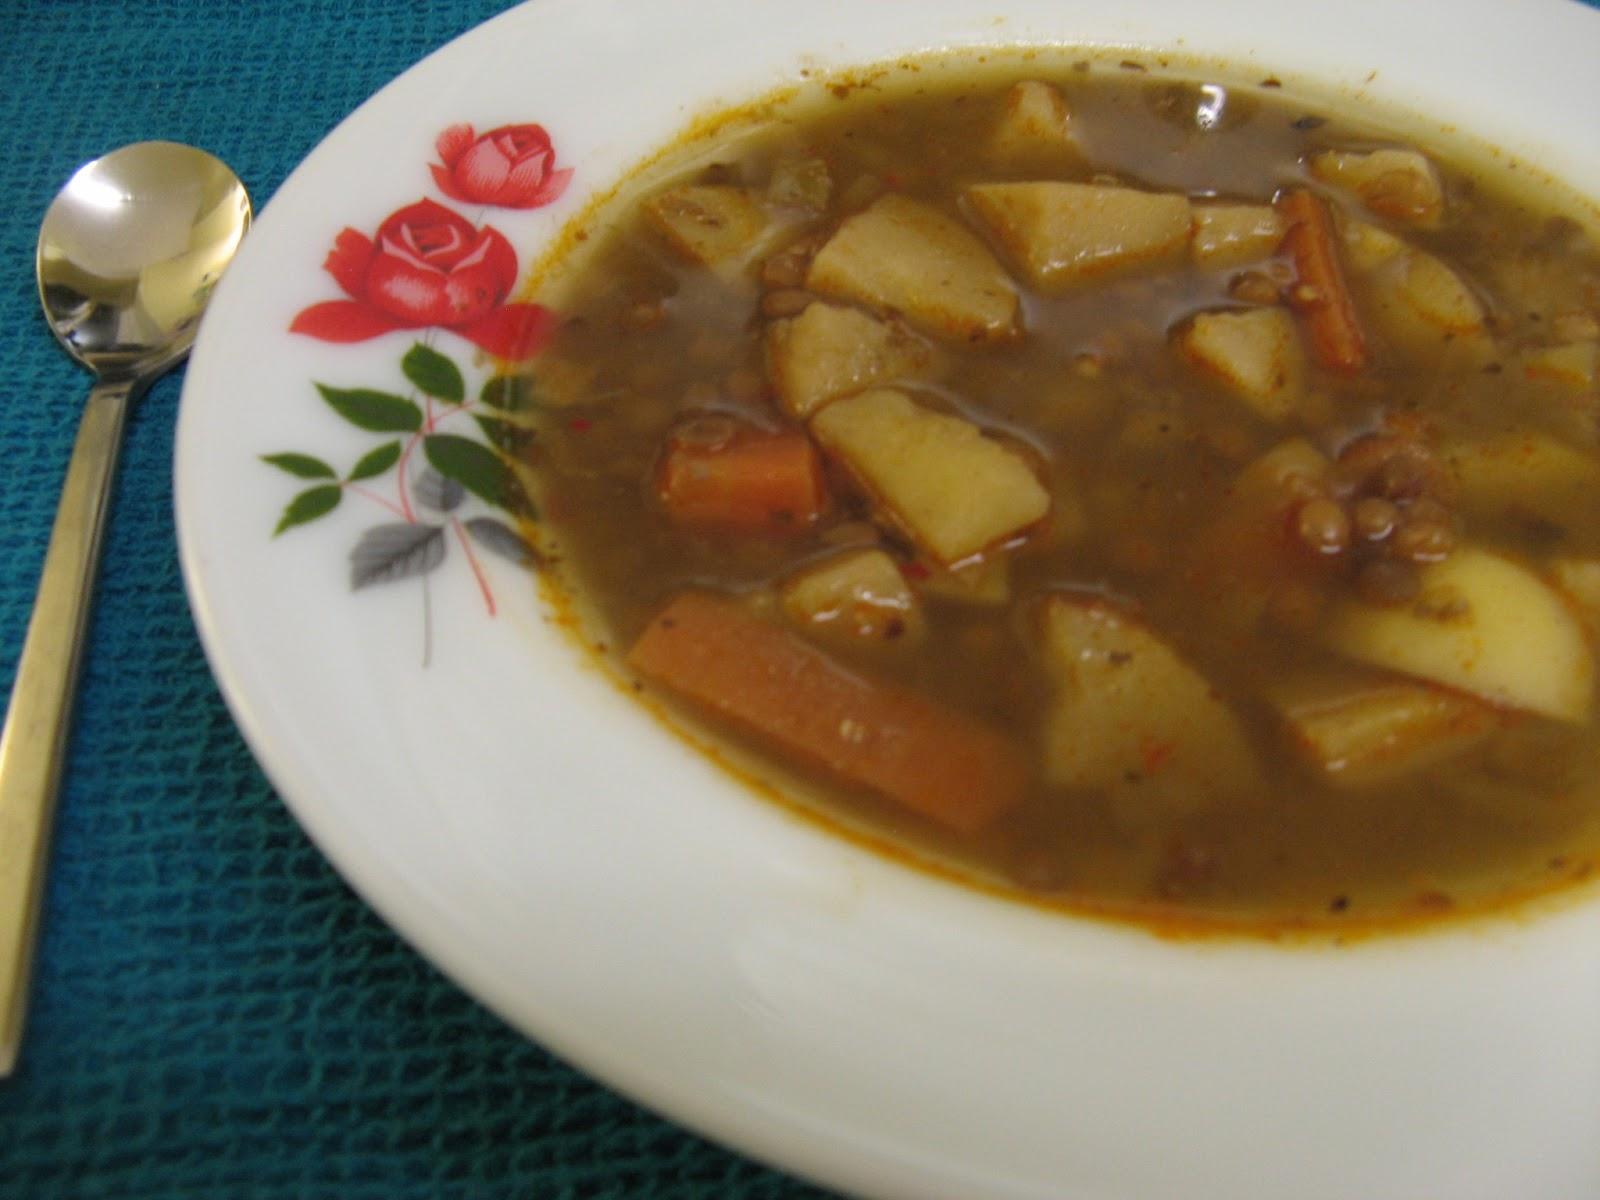 Not your Average Potato Soup